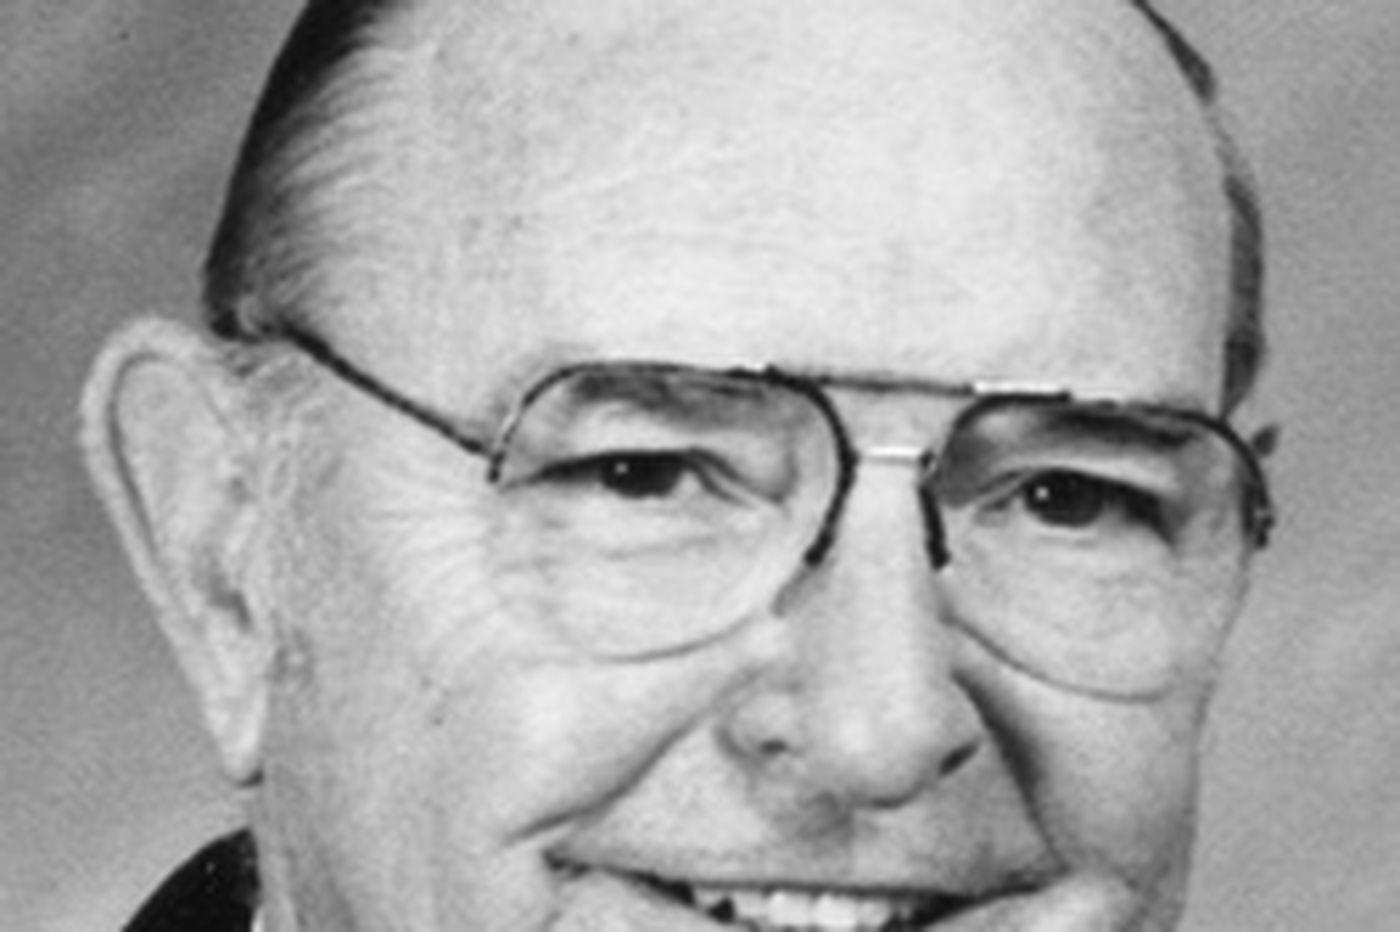 Rev. Robert Shay, 40-year missionary